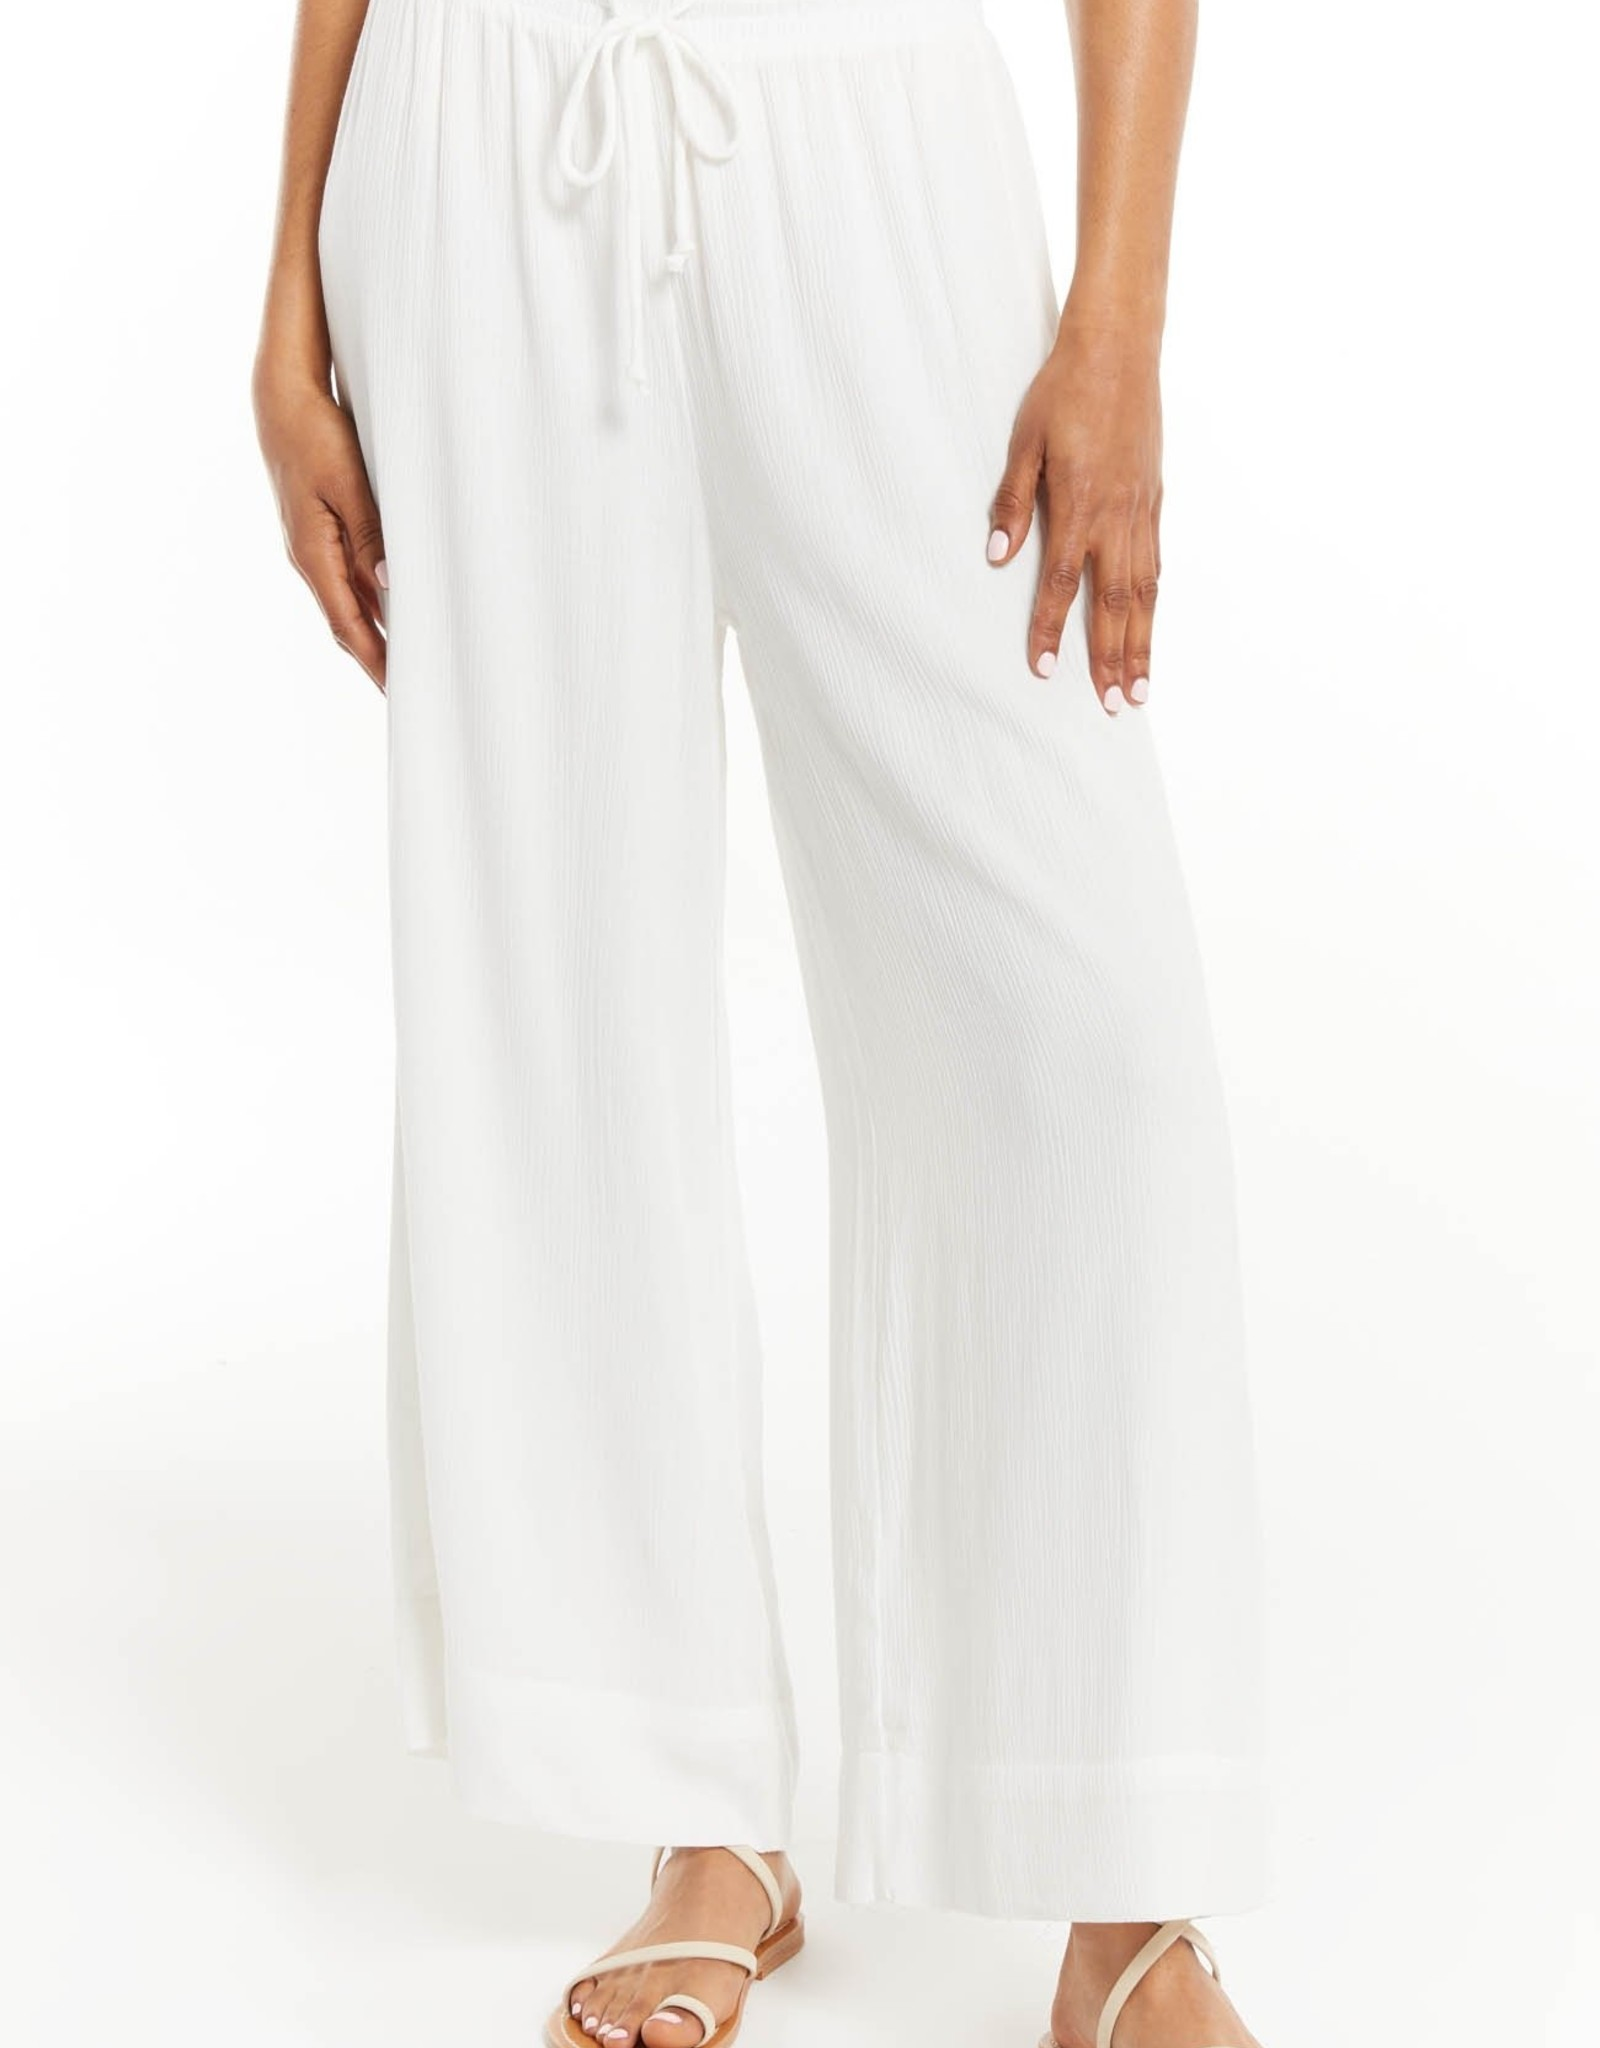 Z Supply Whitesands Wide Leg Pants